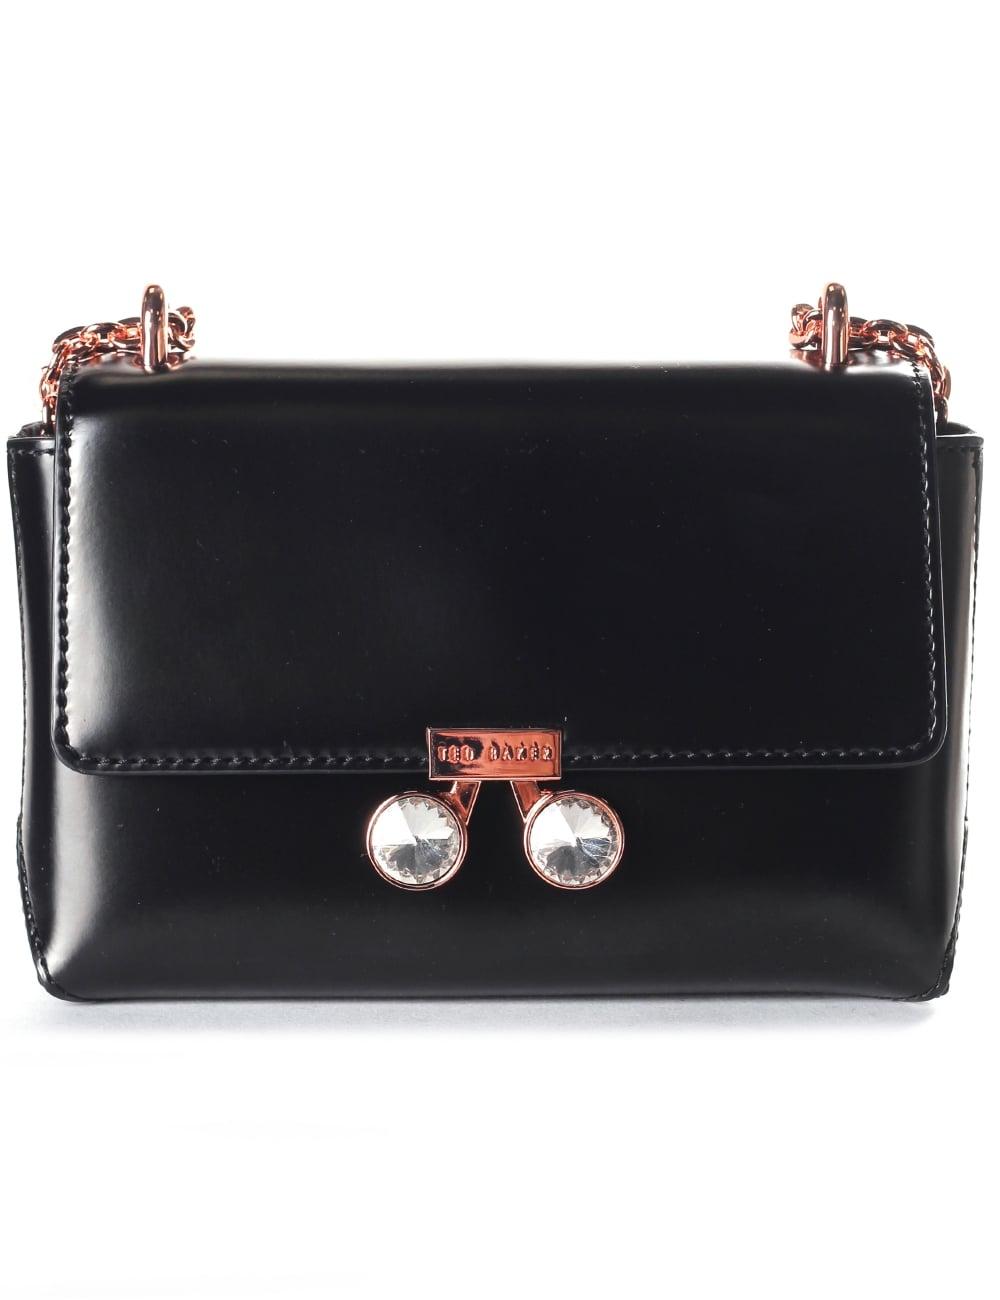 739fc494a31b46 Ted Baker Adoni Crystal Lock Women s Mini Crossbody Bag